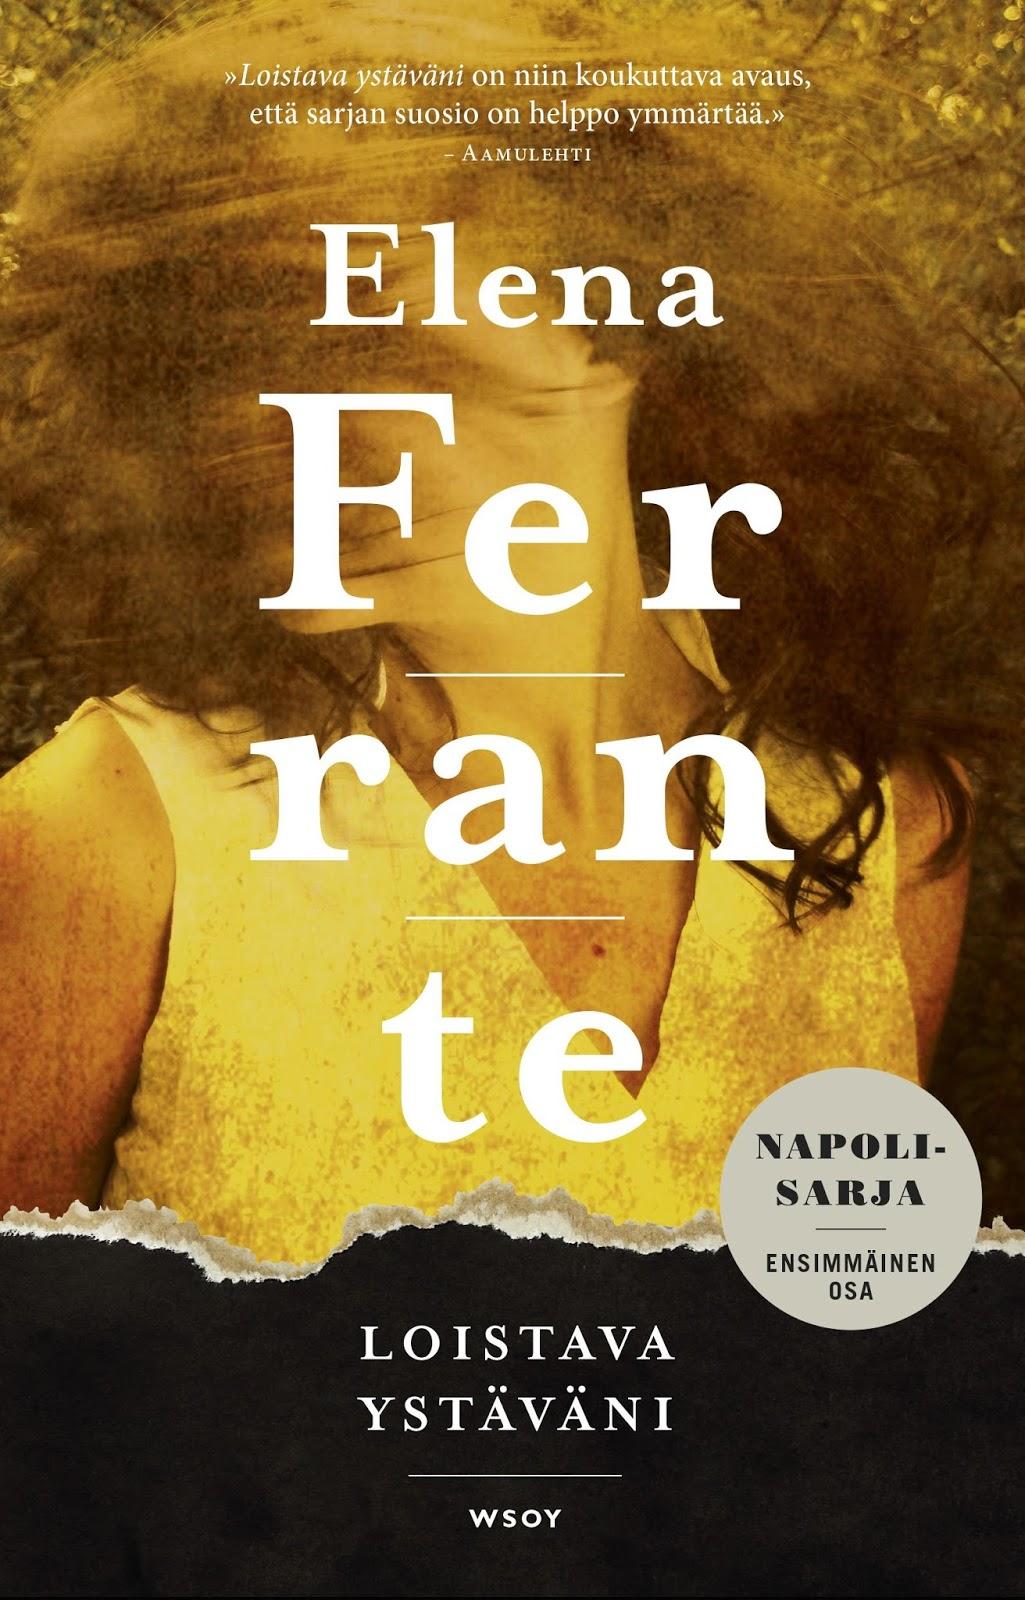 Ferrante Napoli Sarja